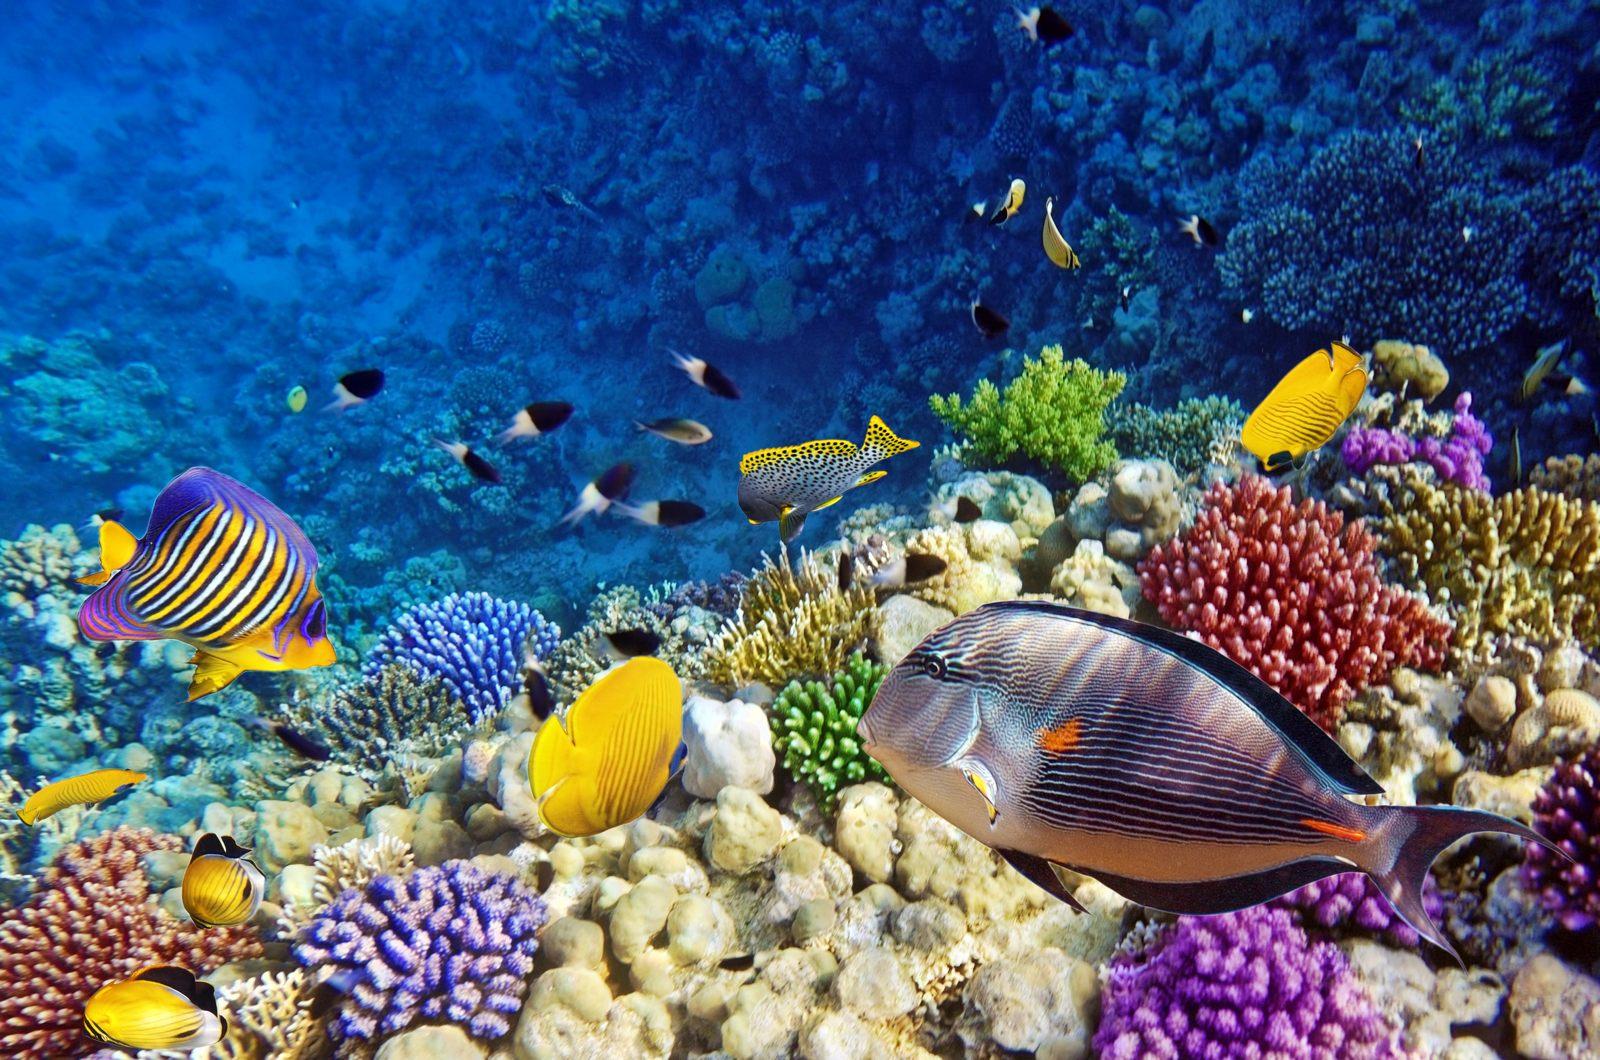 [48+] Coral Reef Wallpaper HD on WallpaperSafari